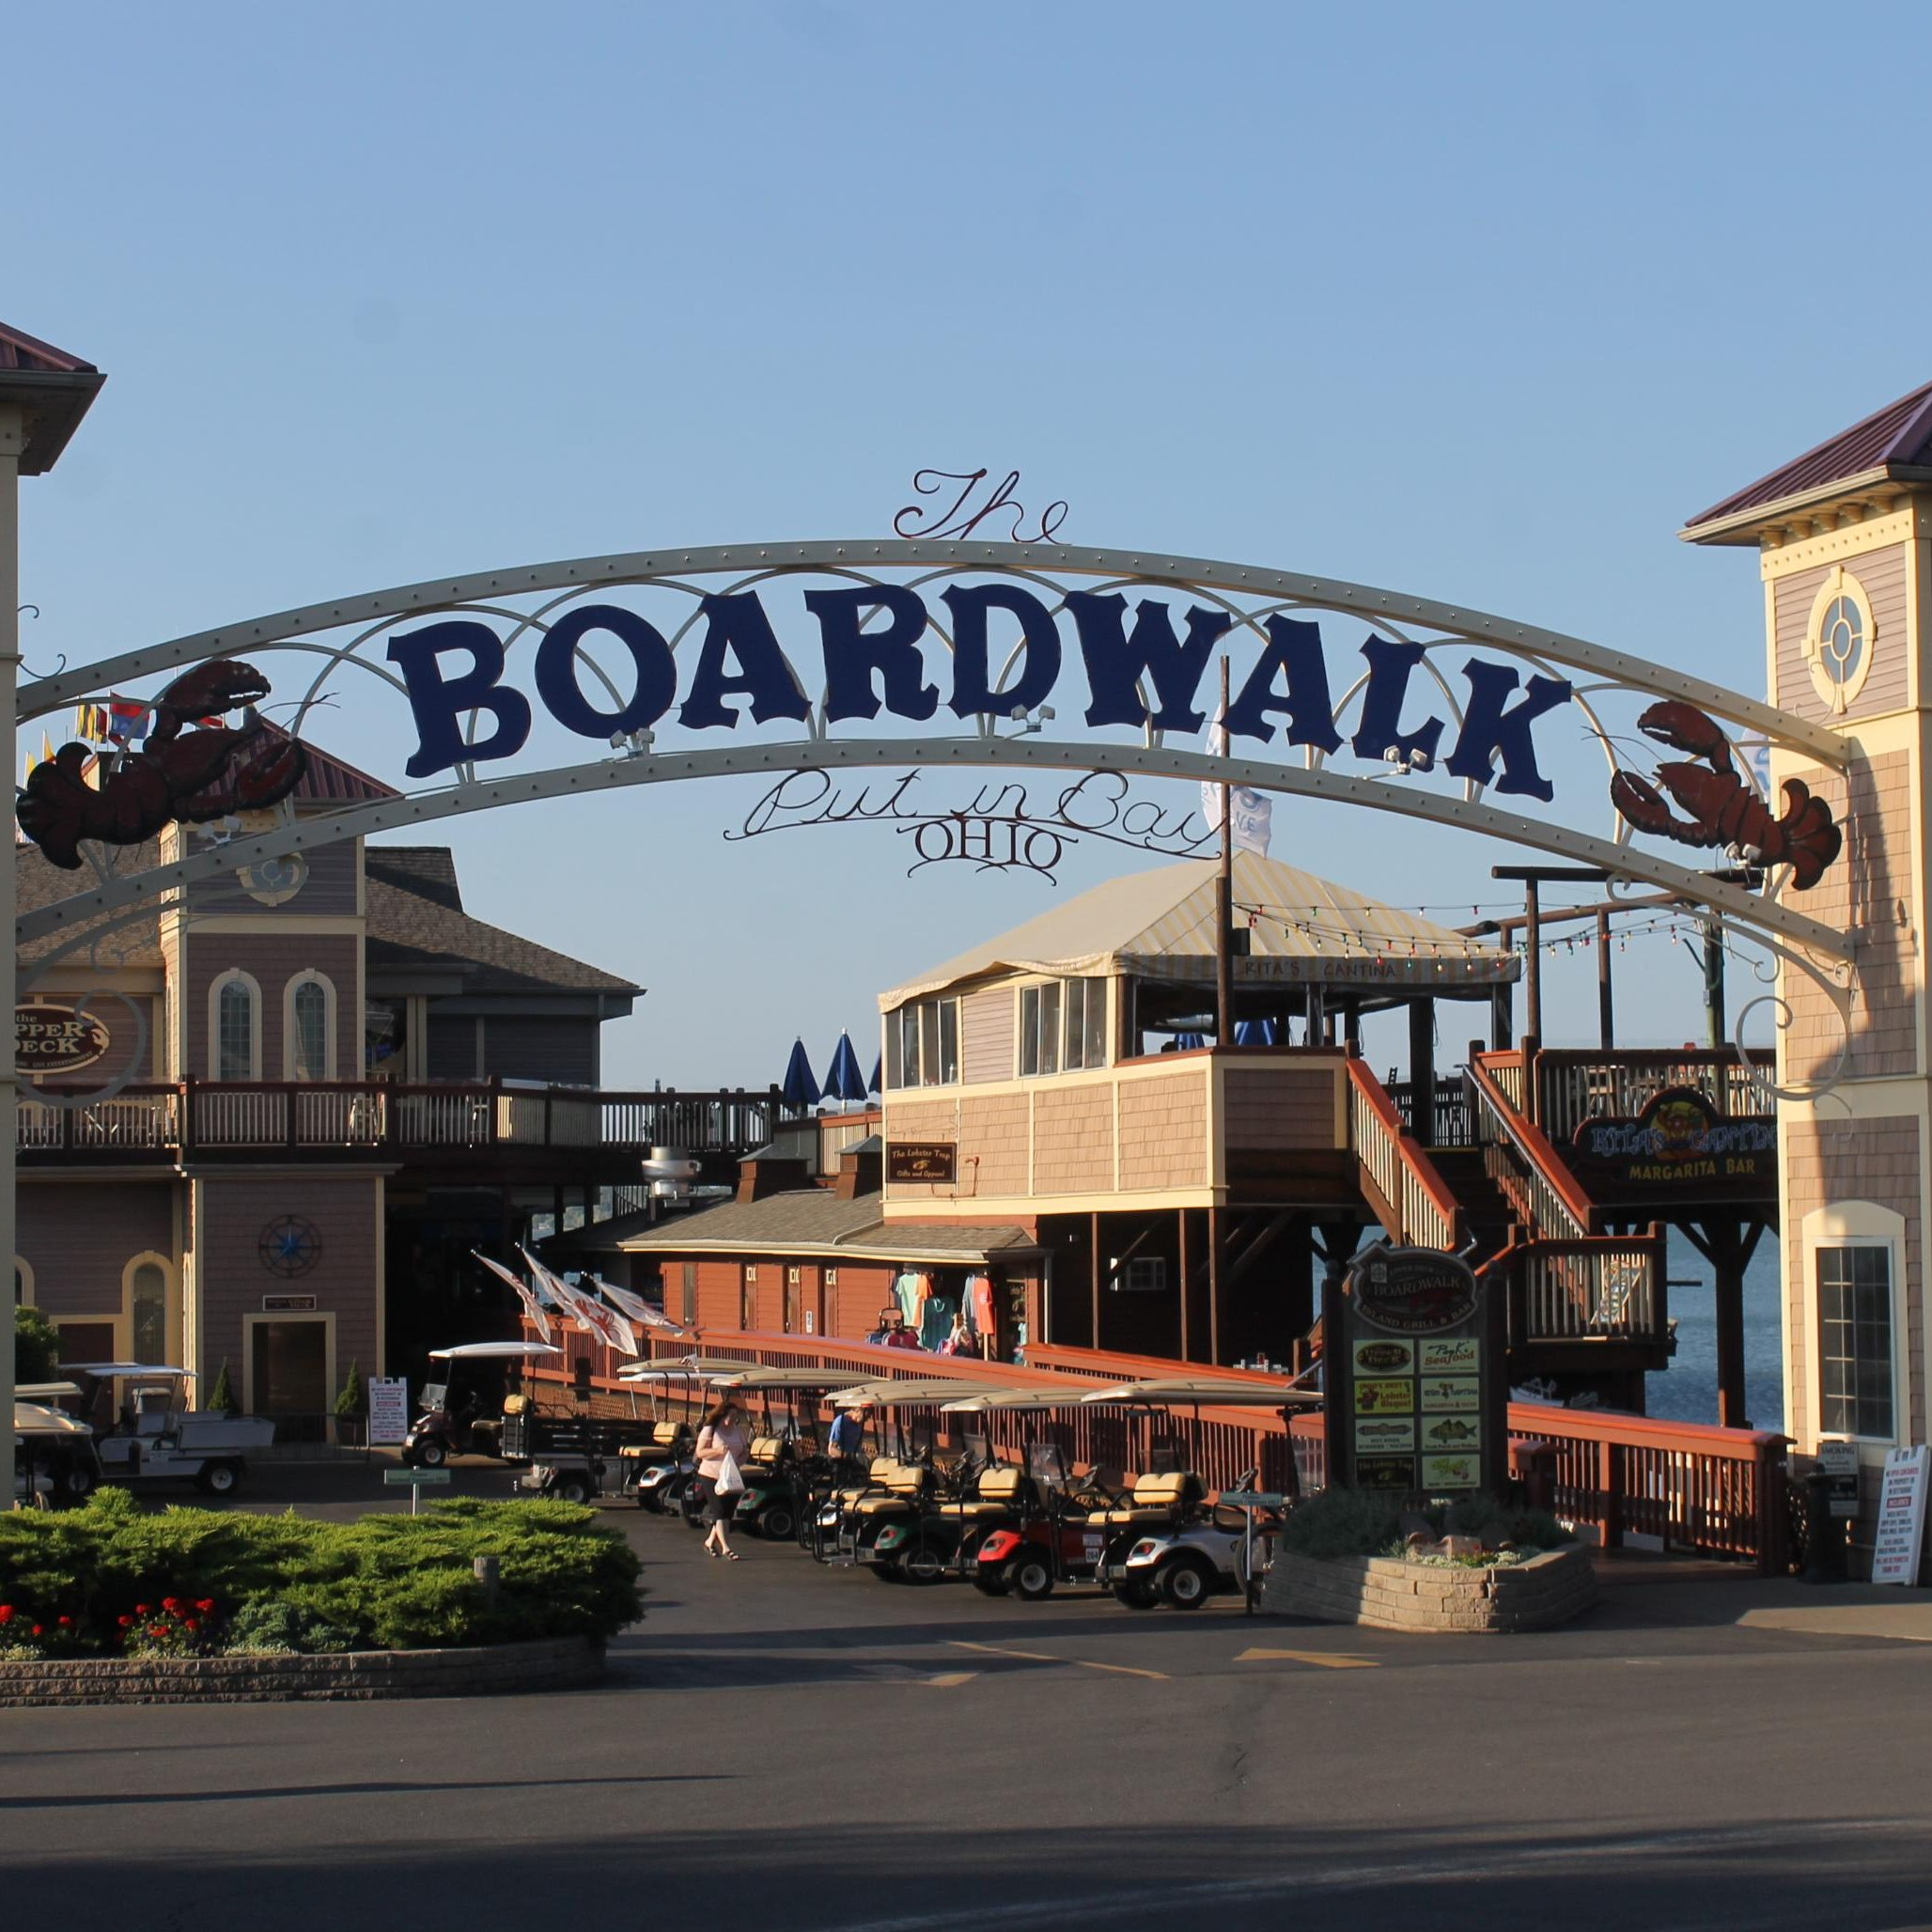 The Boardwalk Put in Bay